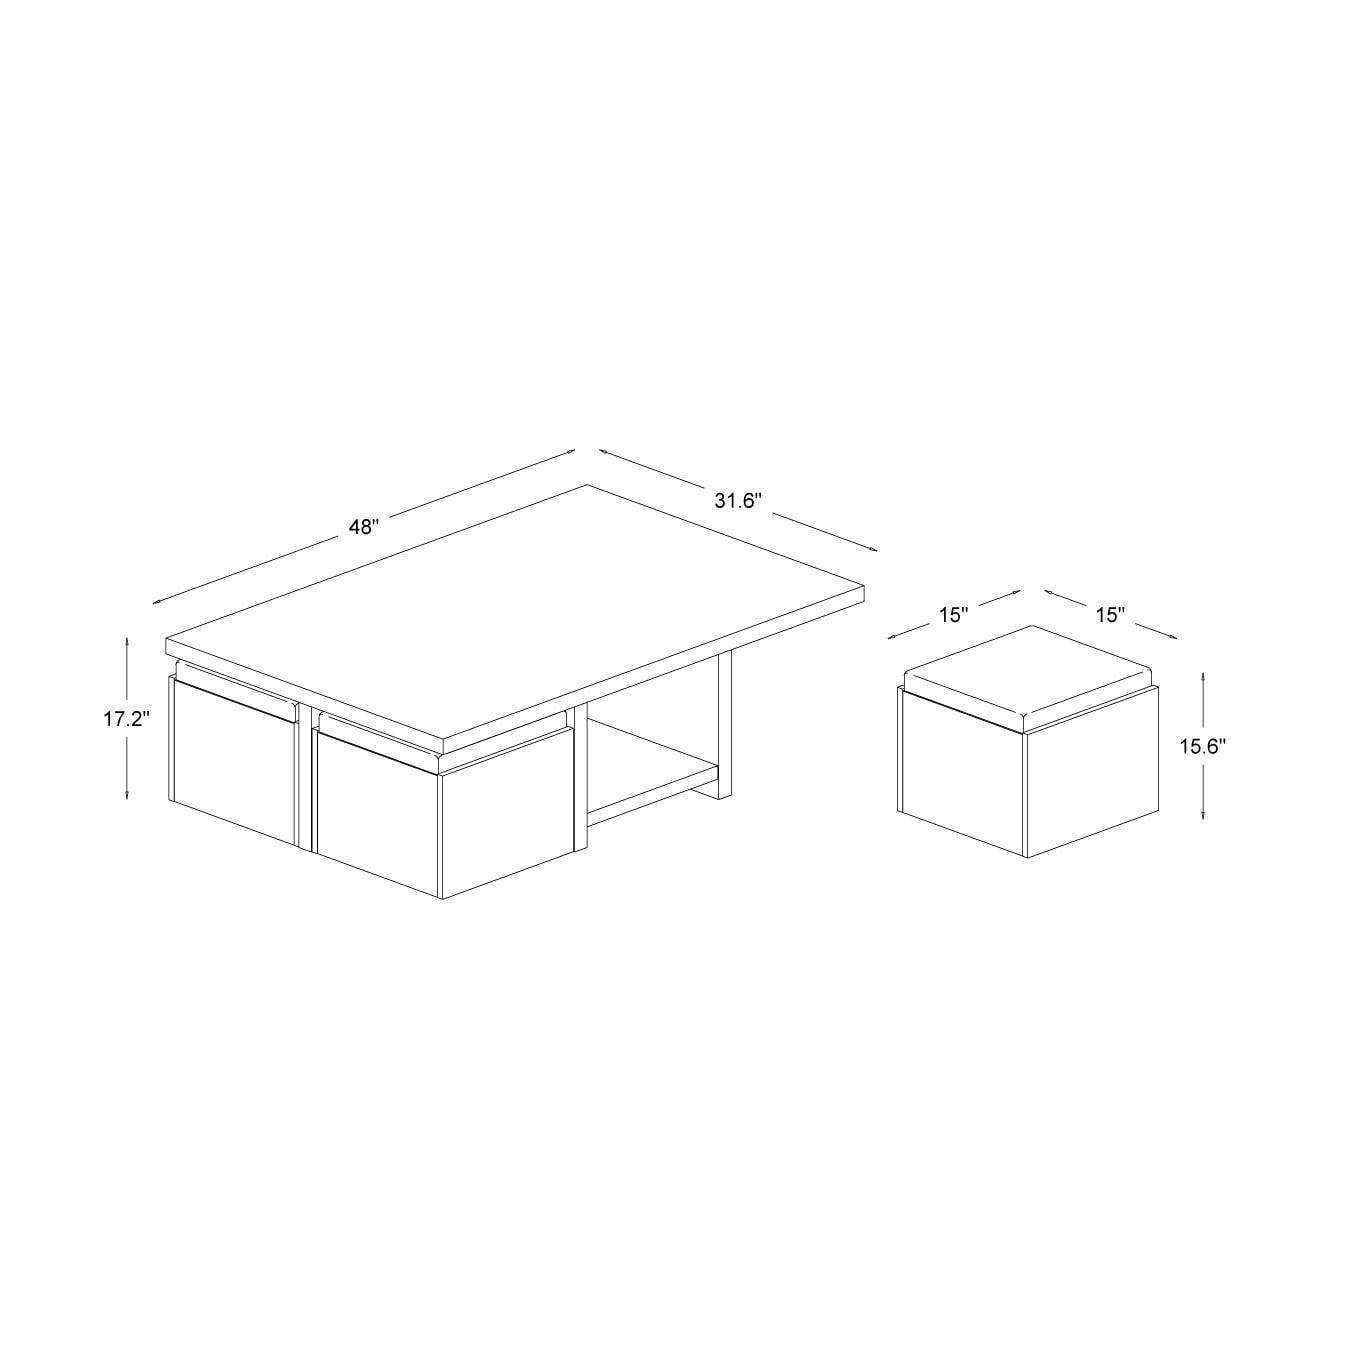 Baxton Studio Prescott Modern Table With Nesting Stool Storage Set Free Shipping Today 13818697